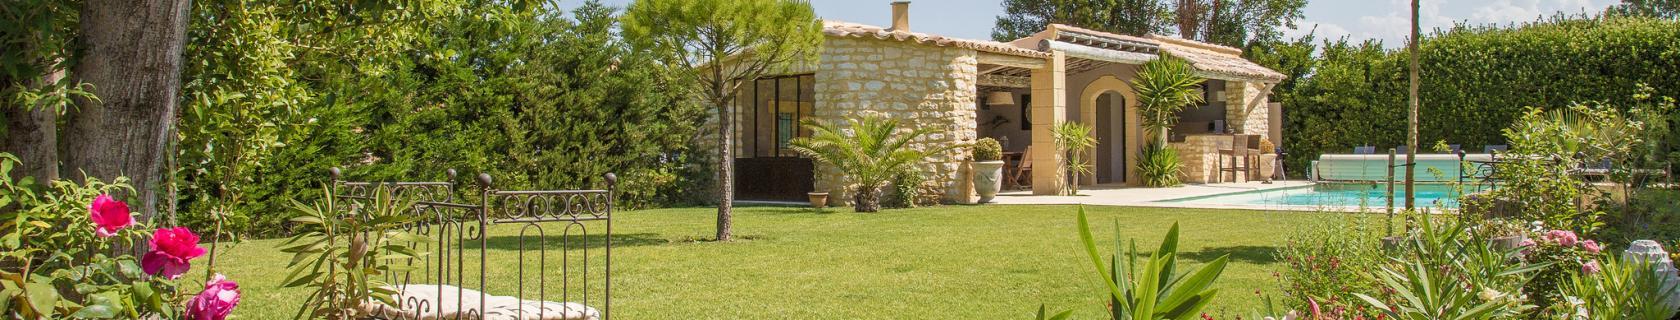 Locations Vacances Provence Location Gites Chambres D